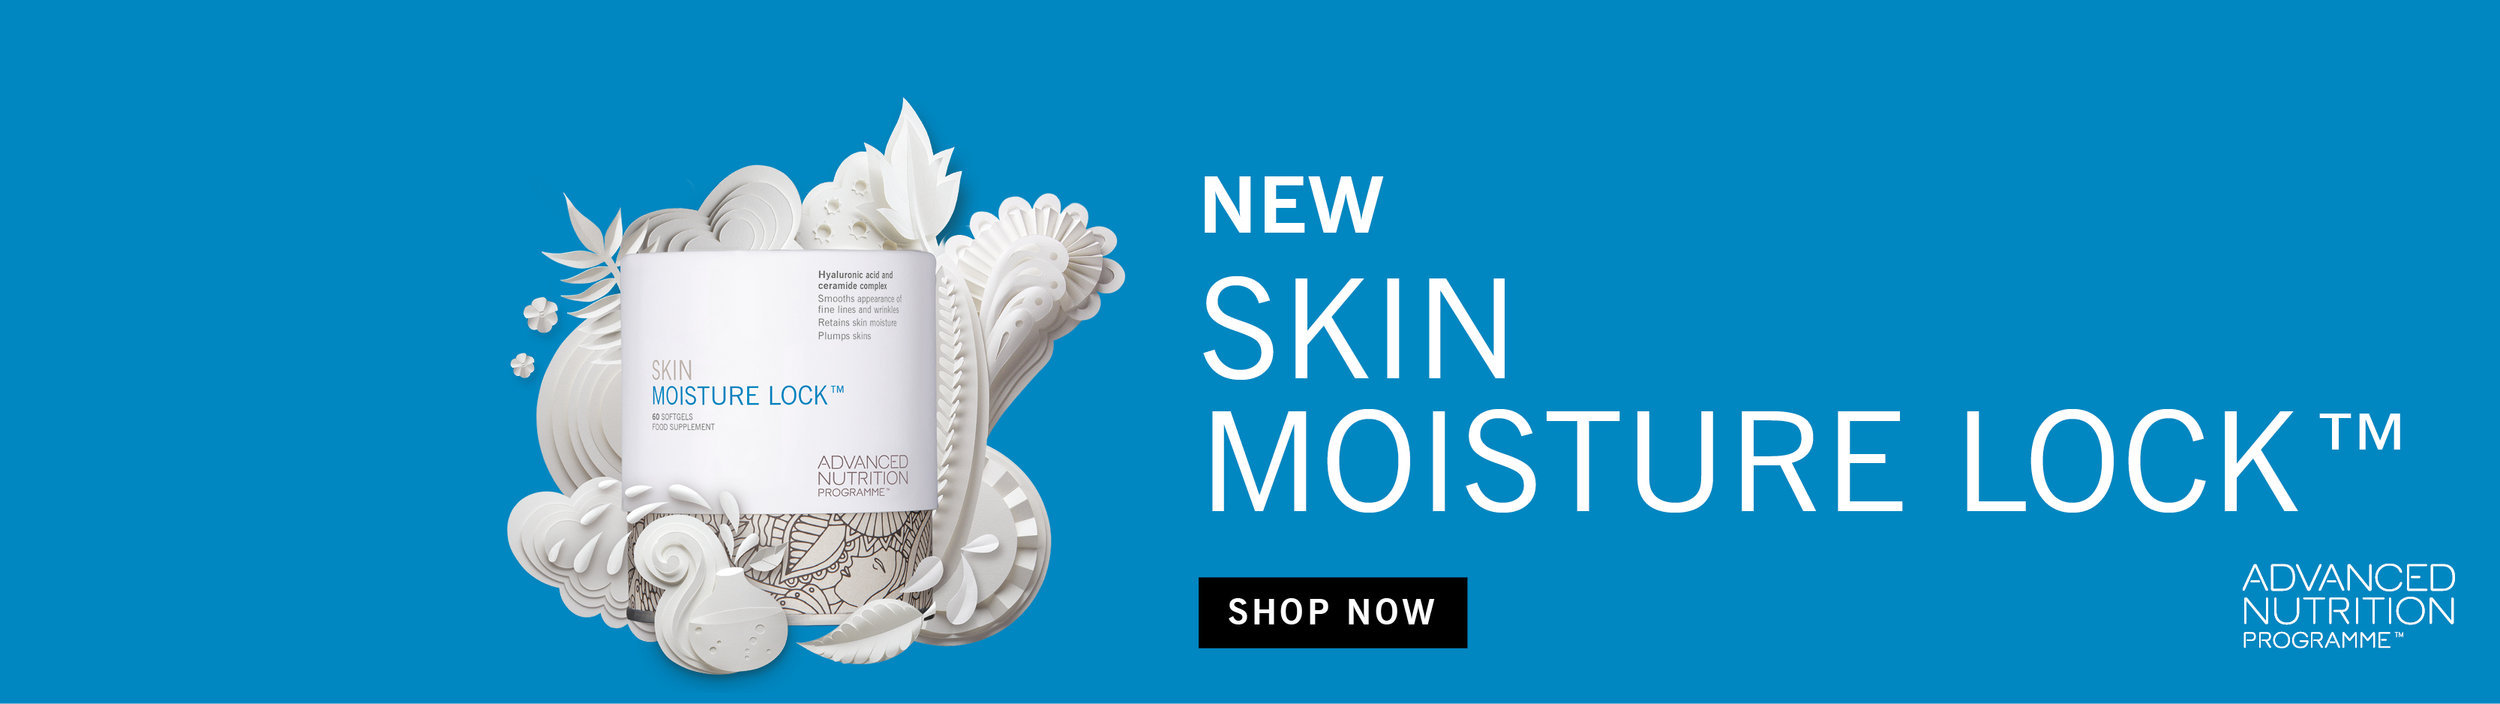 Skin Moisture Lock™ Web Banners.jpg